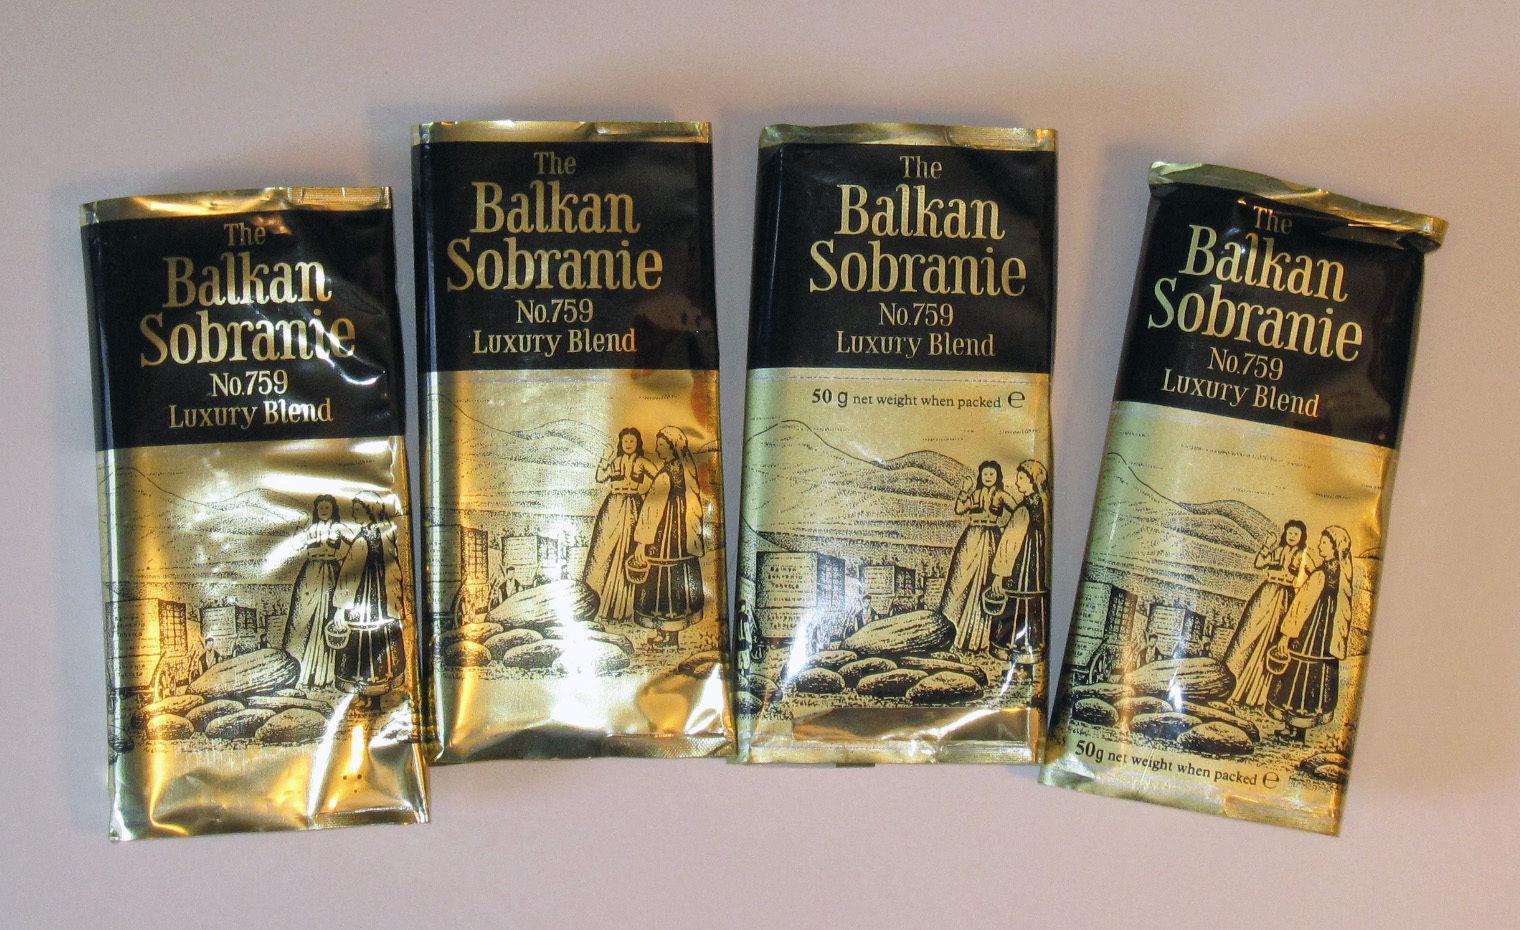 THE BALKAN SOBRANIE. SOBRANIE OF LONDON Balkan10